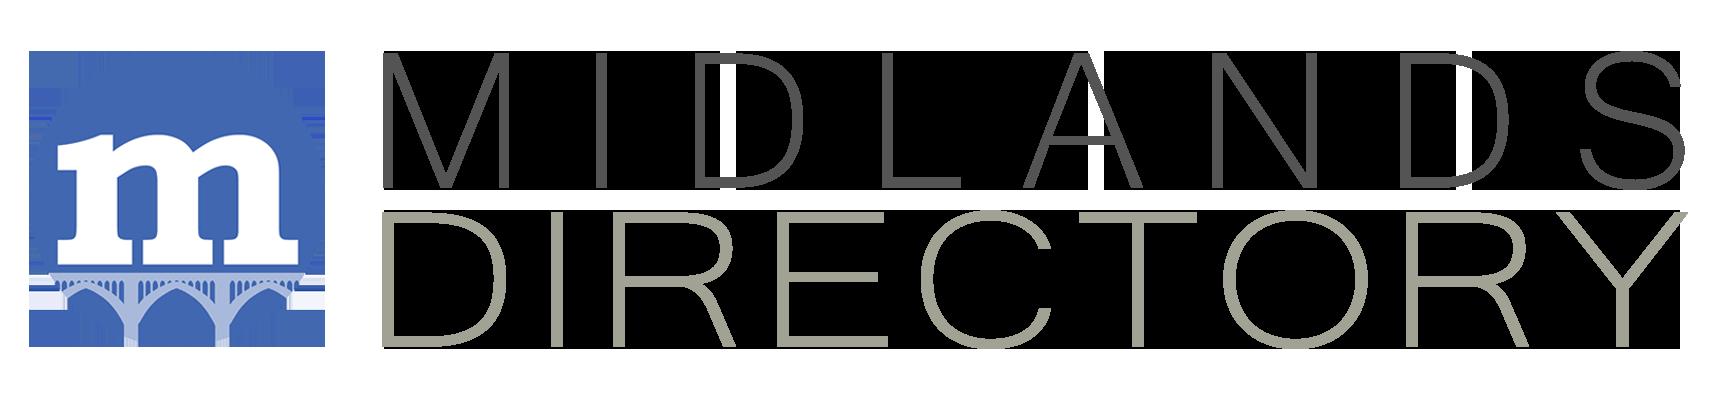 Midlands Directory Logo.png